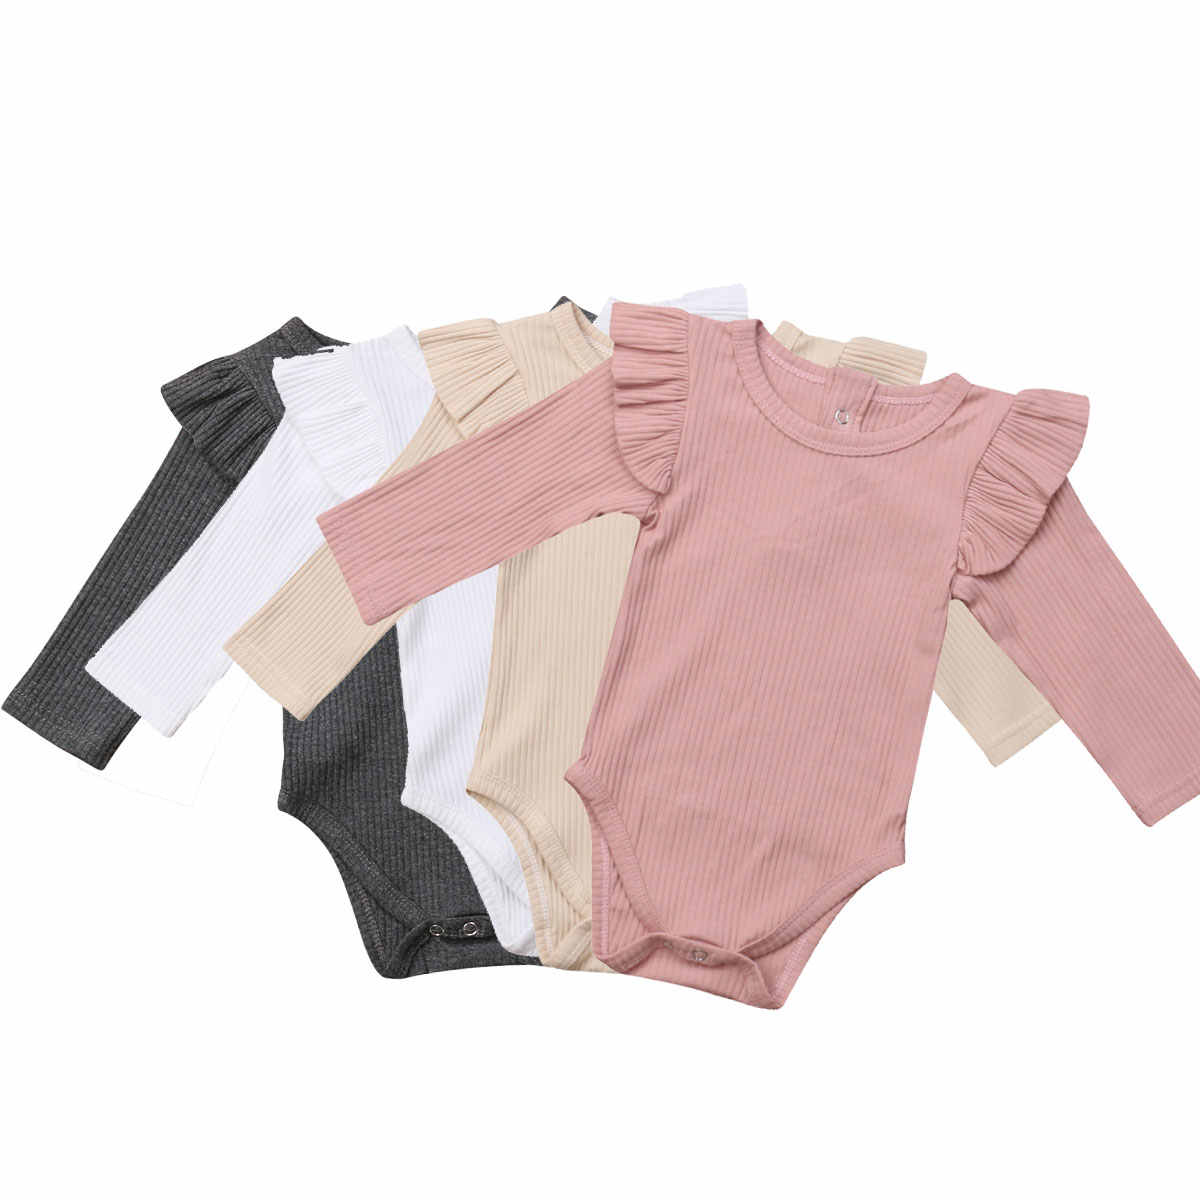 Pasgeboren Baby Meisjes Ruches Romper Lange Mouwen Peuter Meisjes Jumpsuit Playsuit Herfst Lente Baby Meisje Kostuums